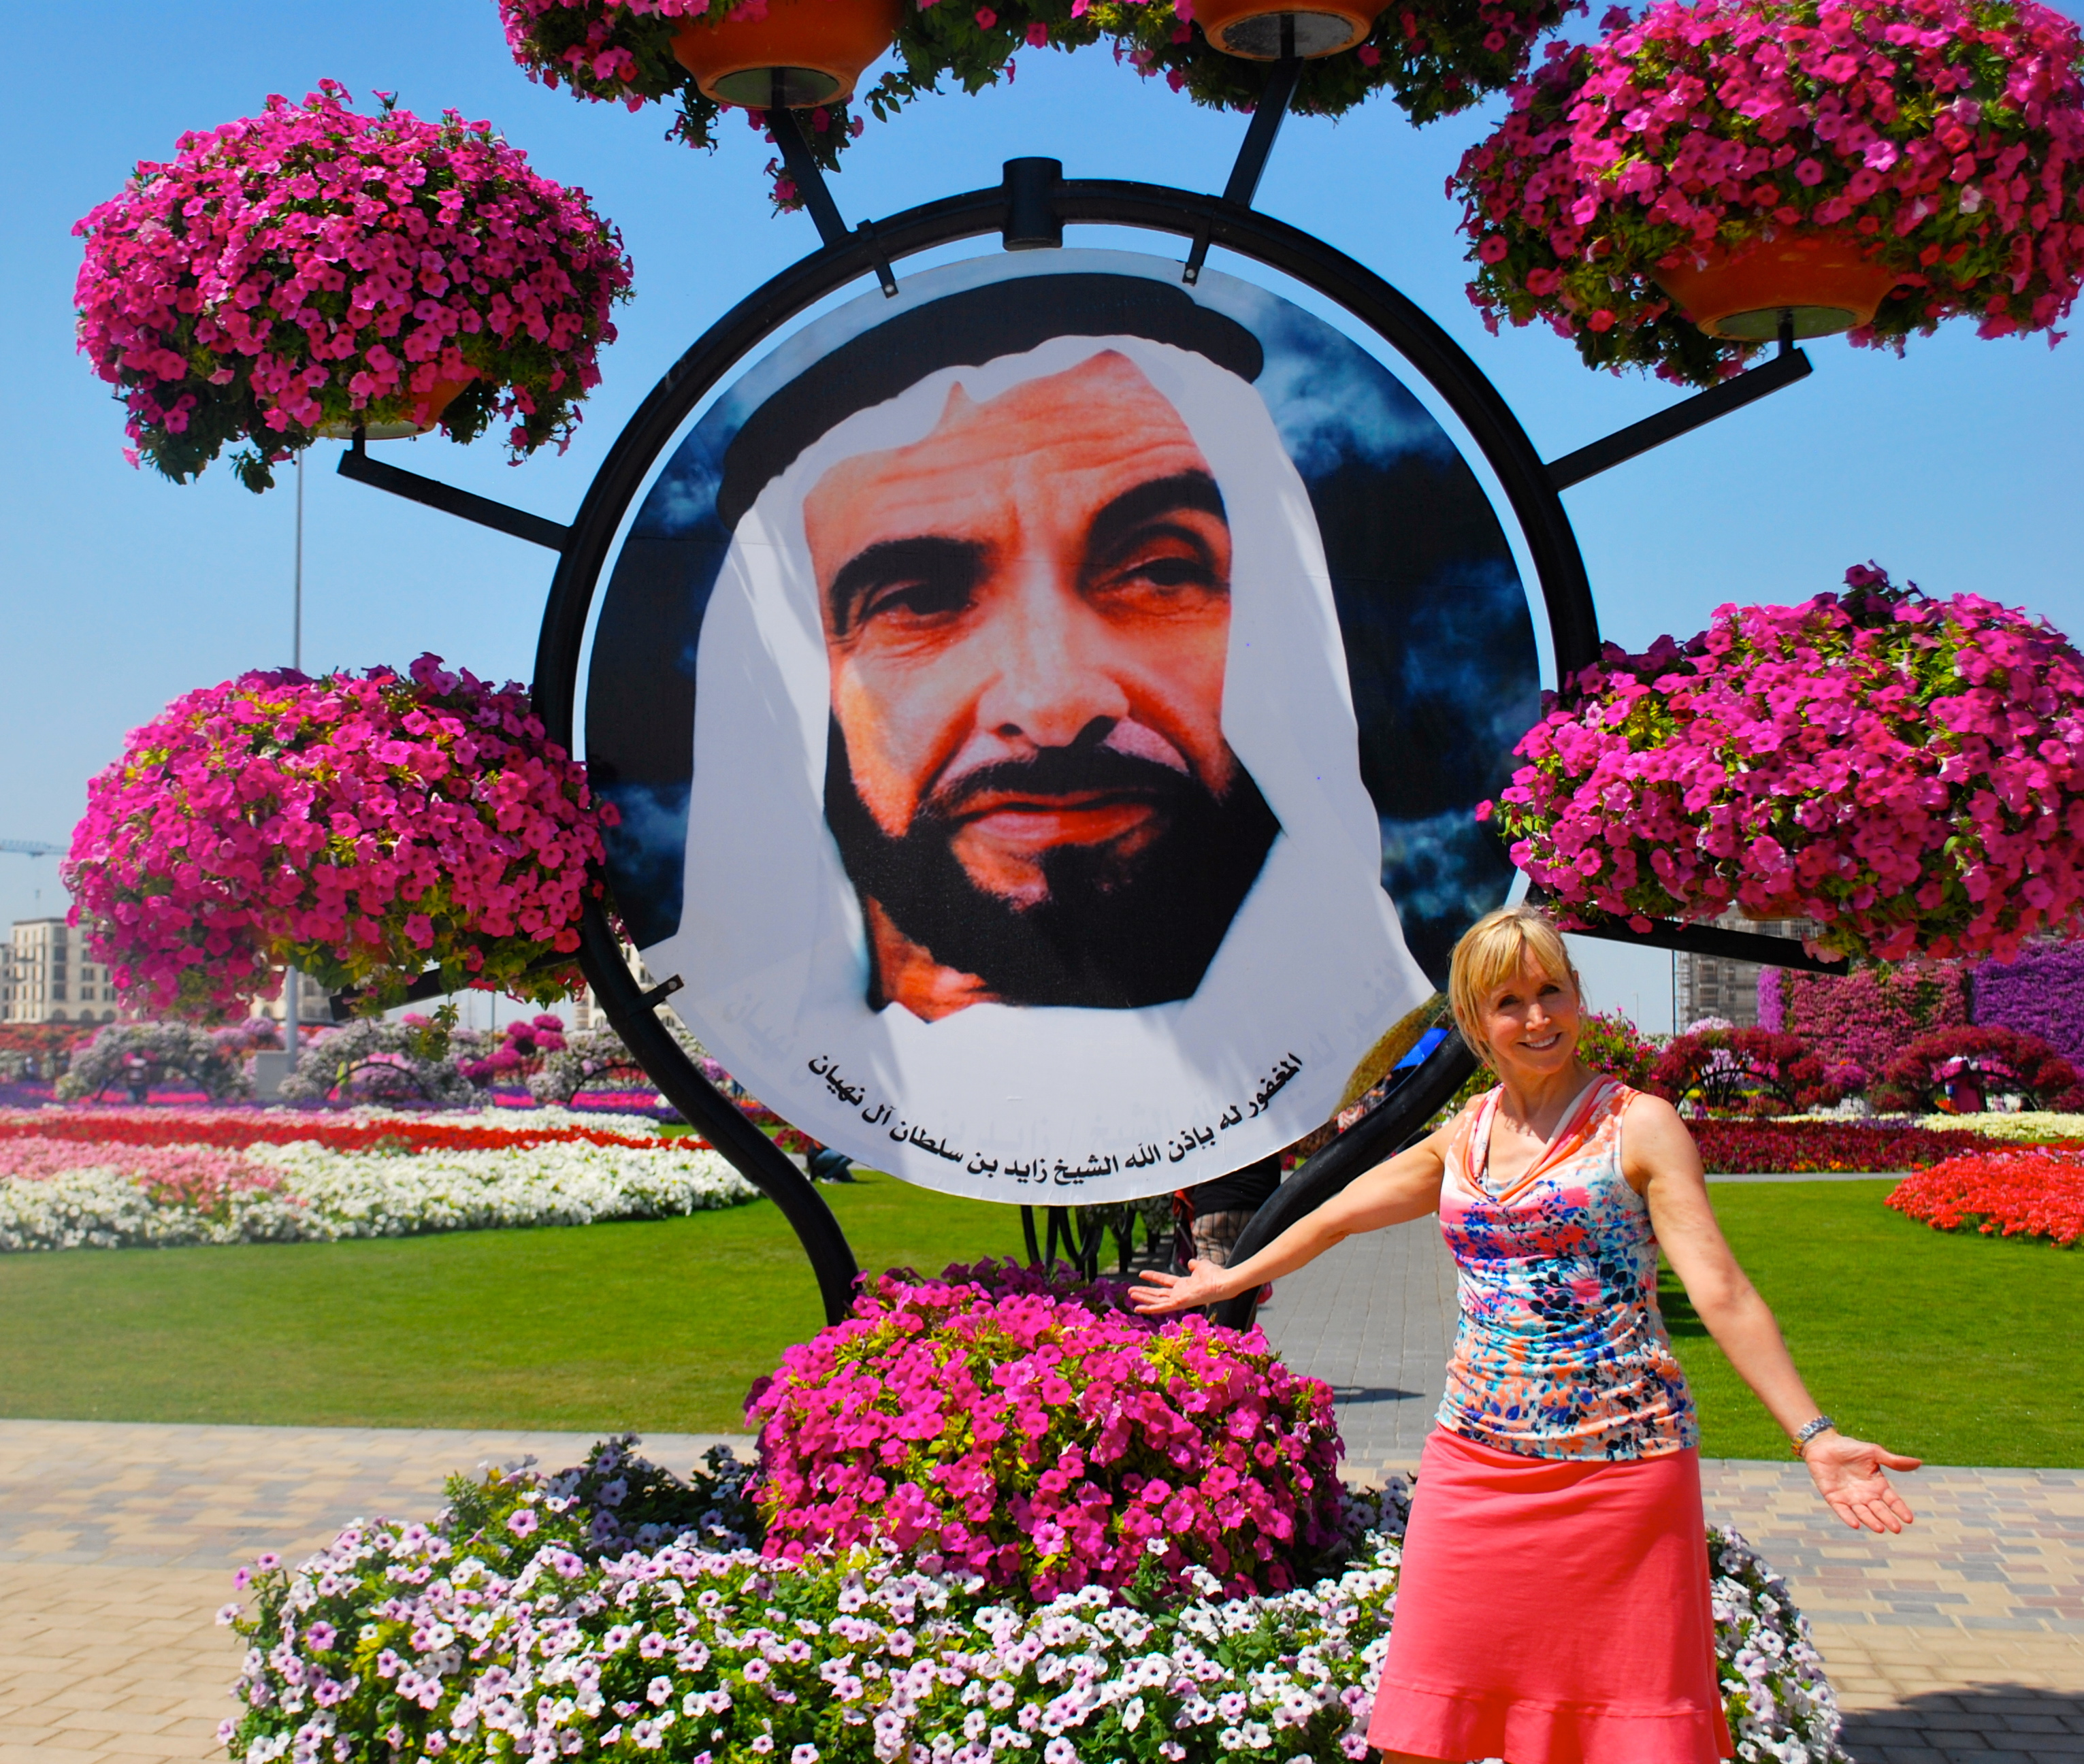 Sheik Zayed bin Sultan Al Nahyan. picture in the Dubai Miracle Garden.